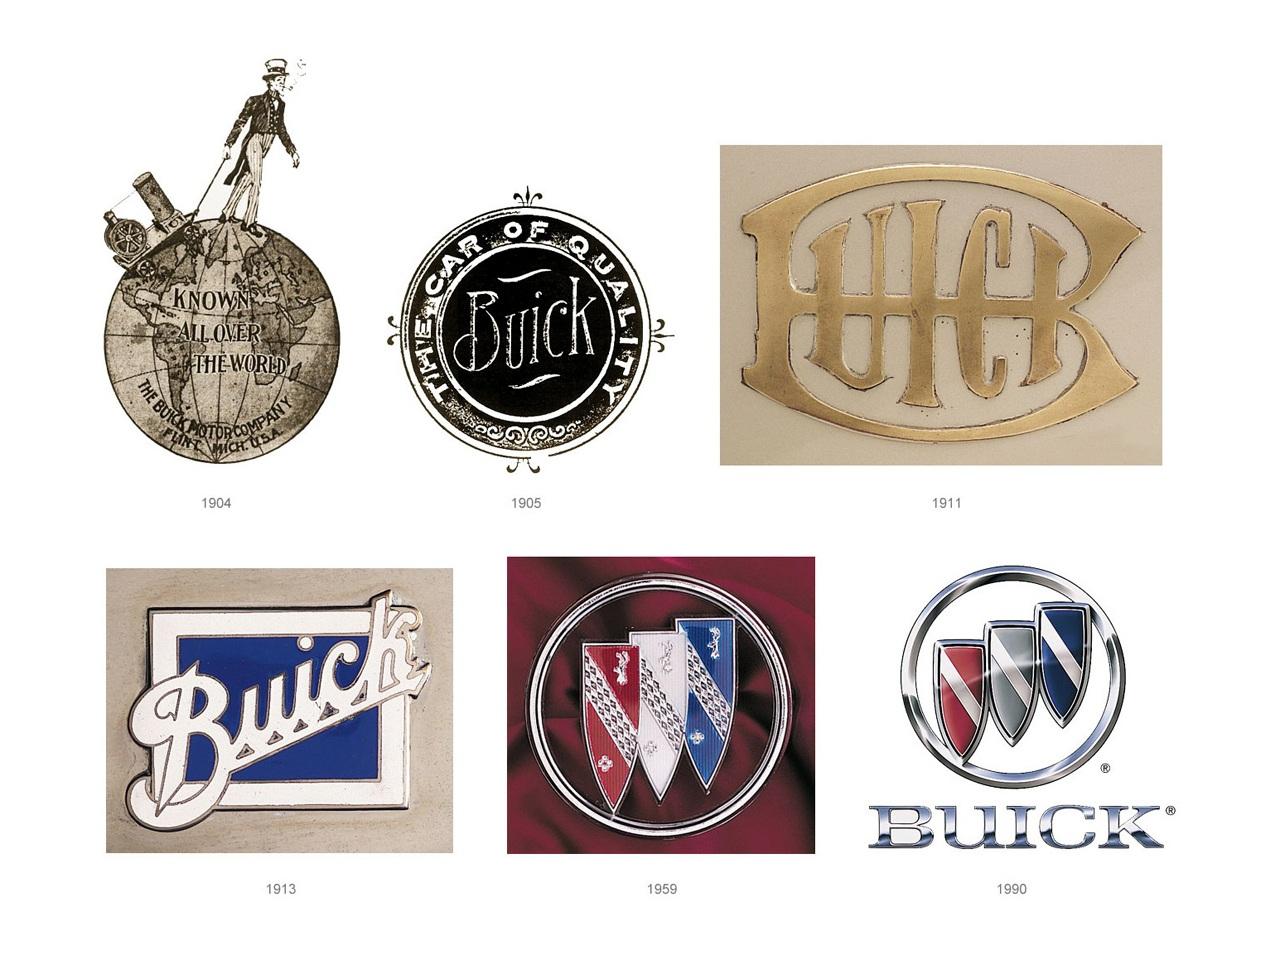 Эволюция эмблемы Buick